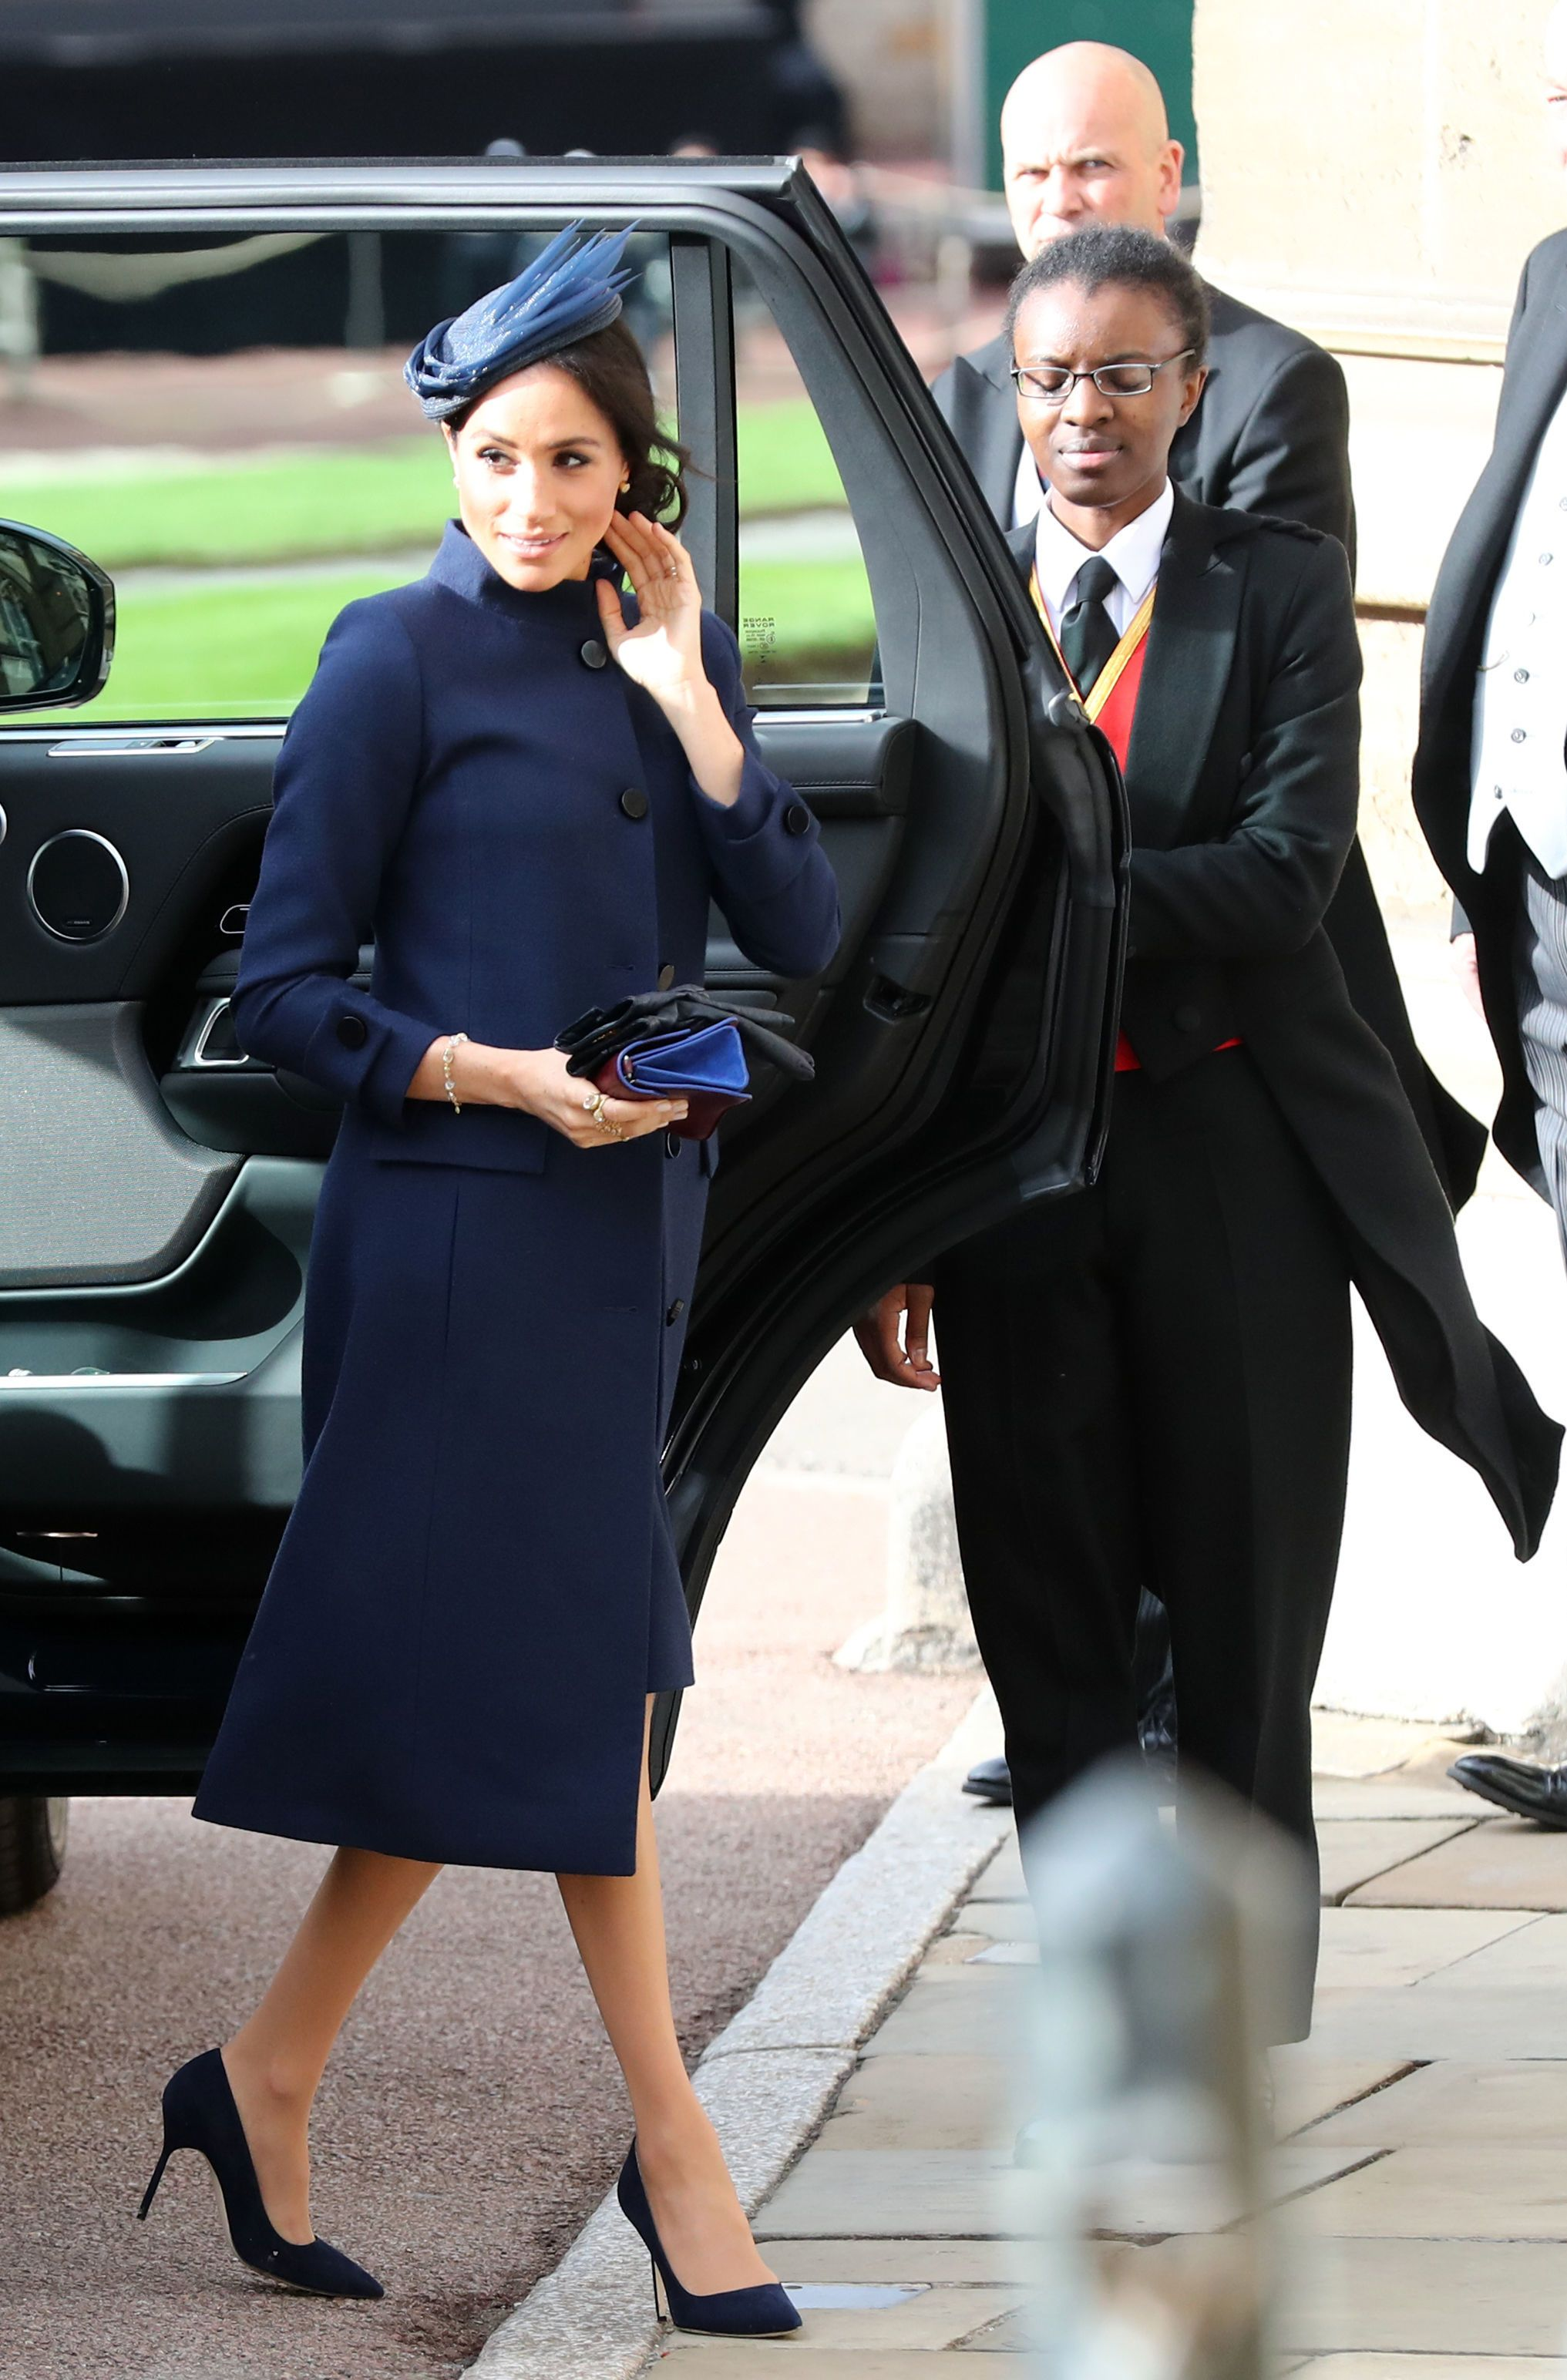 84dc93ee15e Meghan Markle Wears a Navy Givenchy Dress To Princess Eugenie and Jack  Brooksbank s Wedding